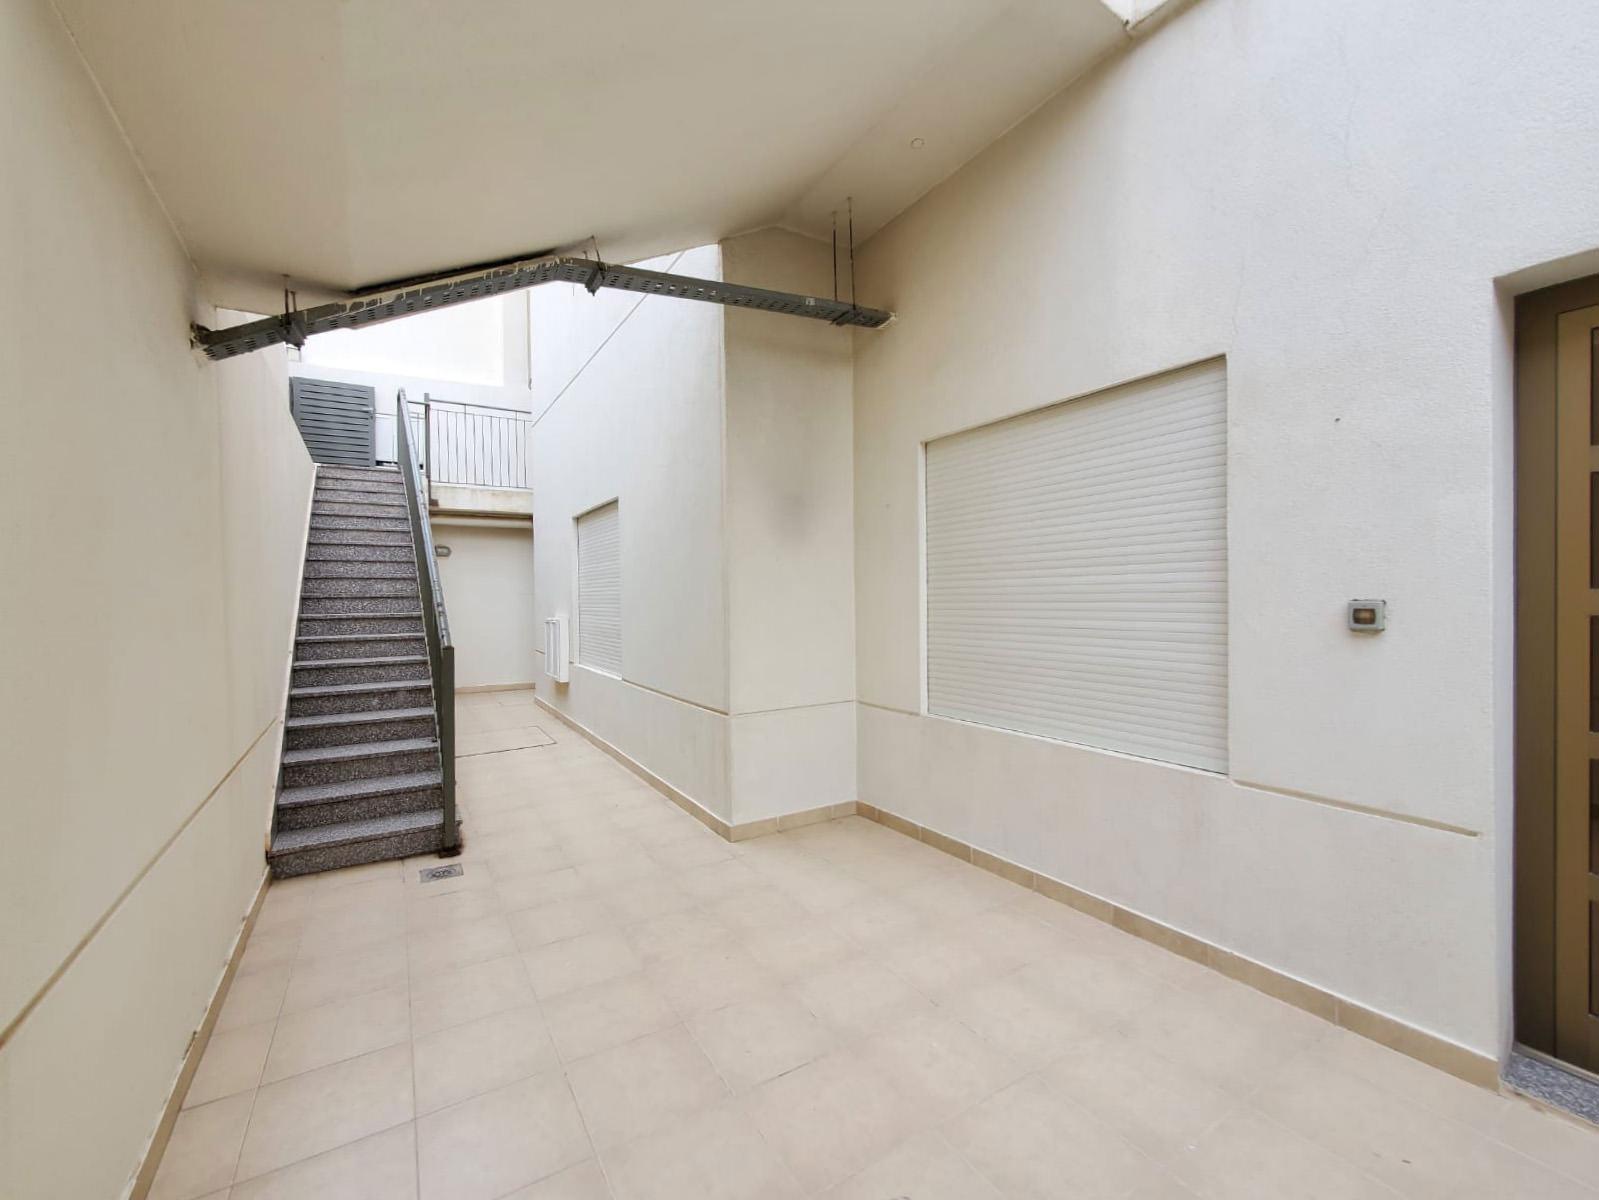 Jabriya – nice, unfurnished three bedroom basement apartment w/yard